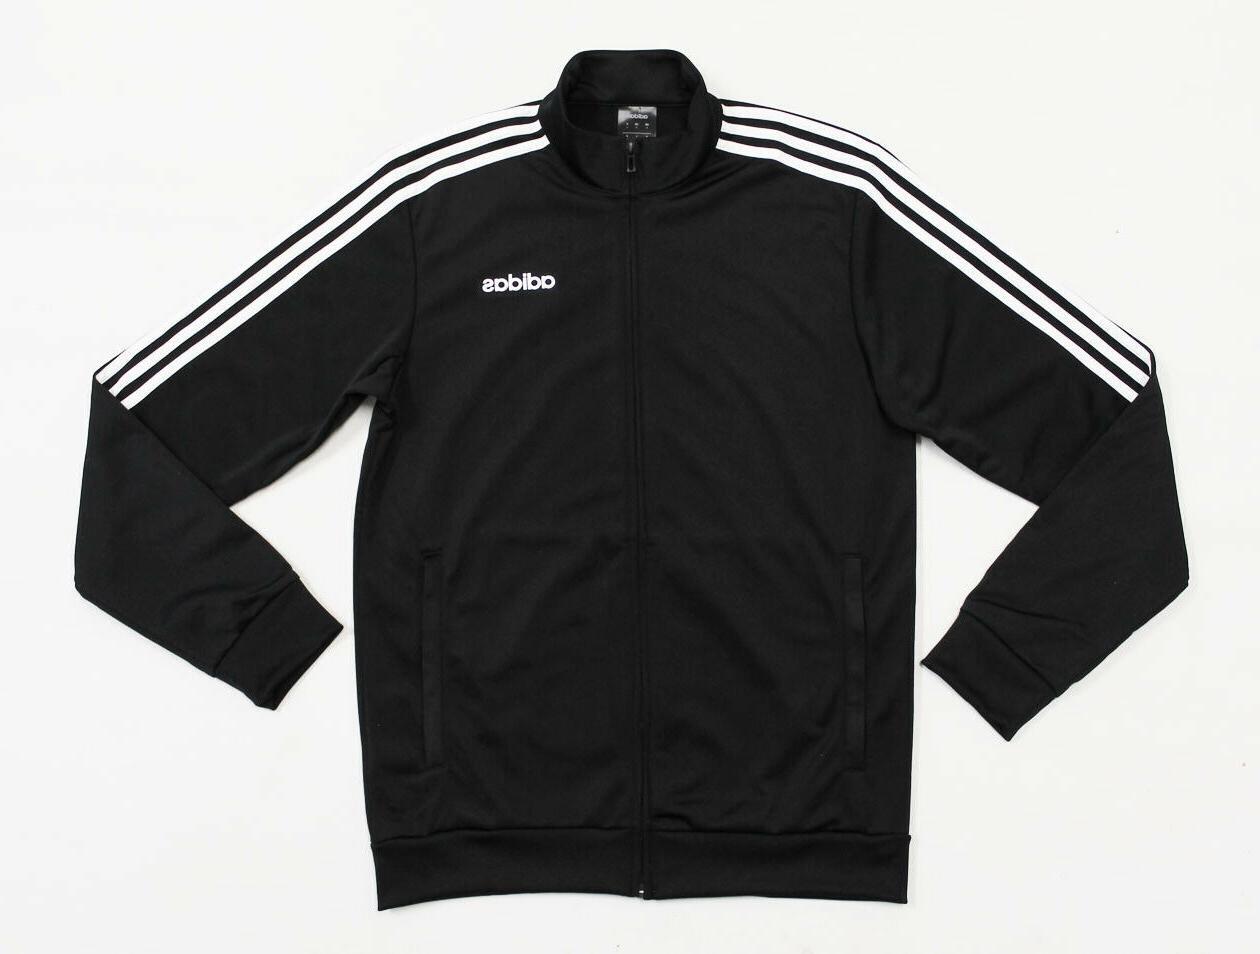 NWT Men's Pocket-Zipper Track Suit Jacket